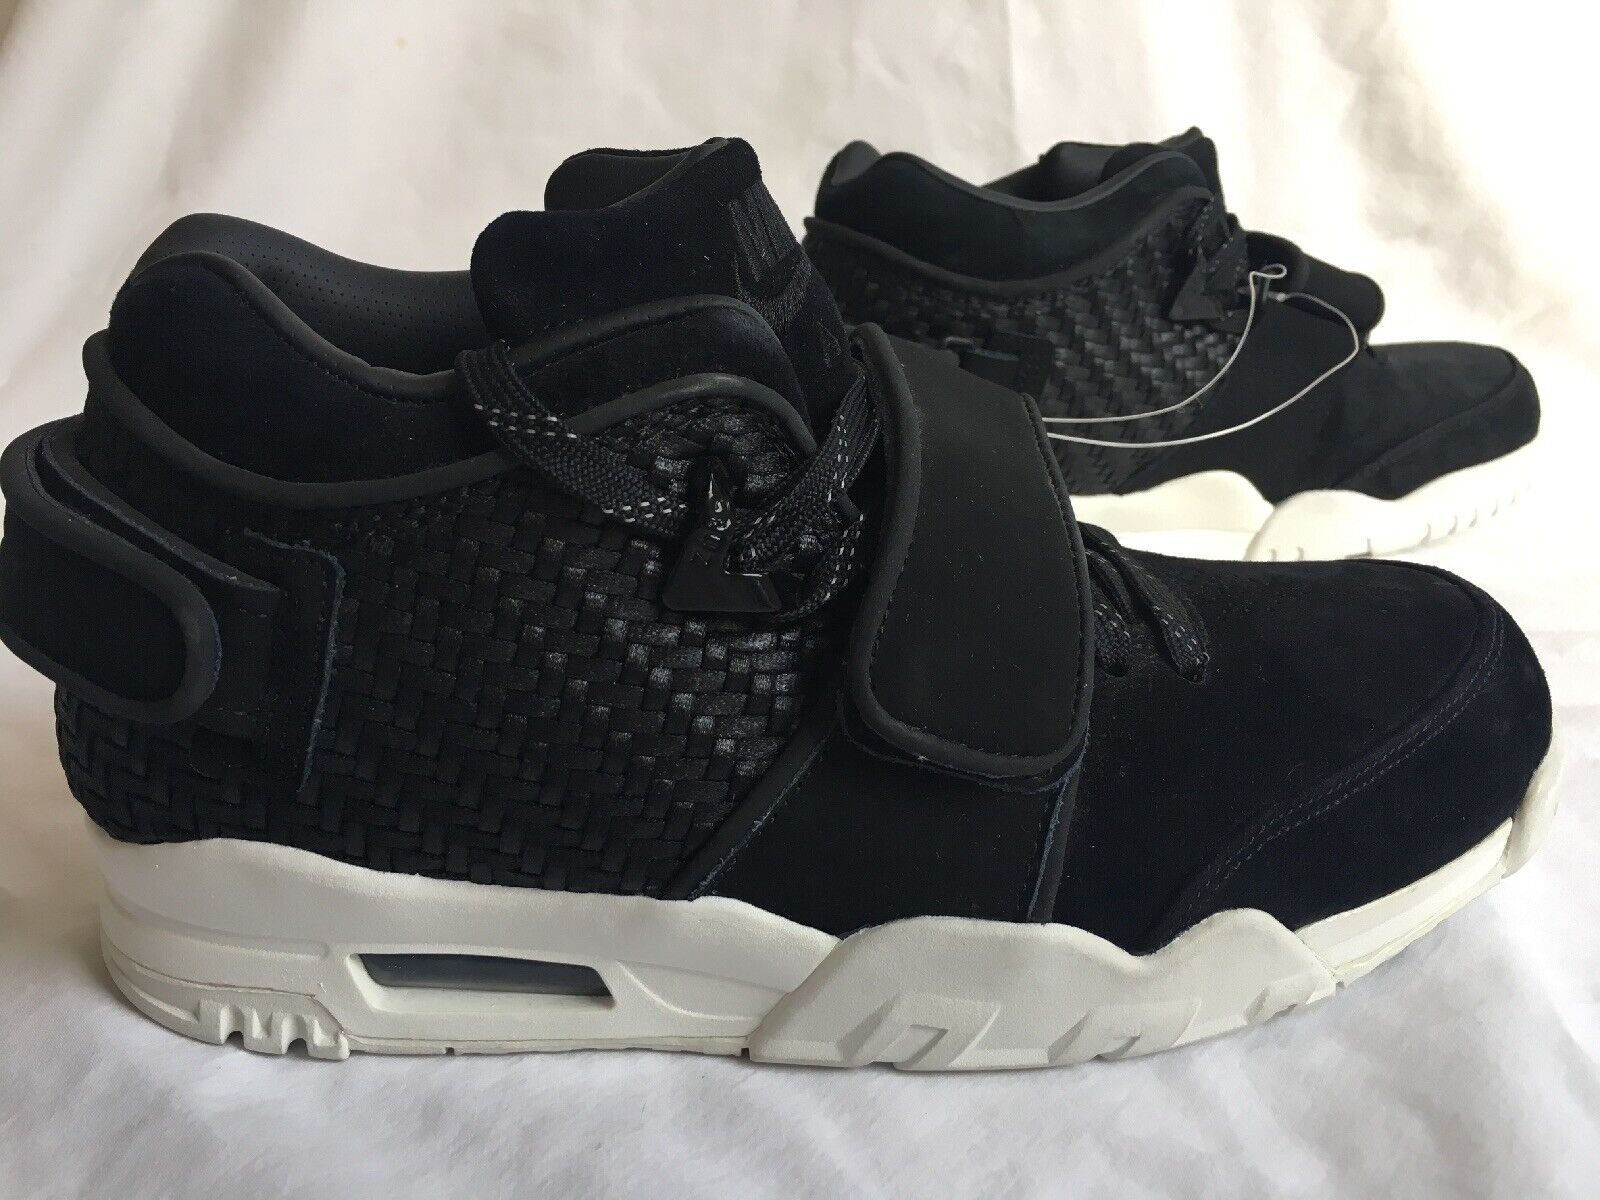 7d3bfe7f85 New Men's Trainer Cruz Black Suede Size 8.5US Nike Air nwnvkj5005-Athletic  Shoes